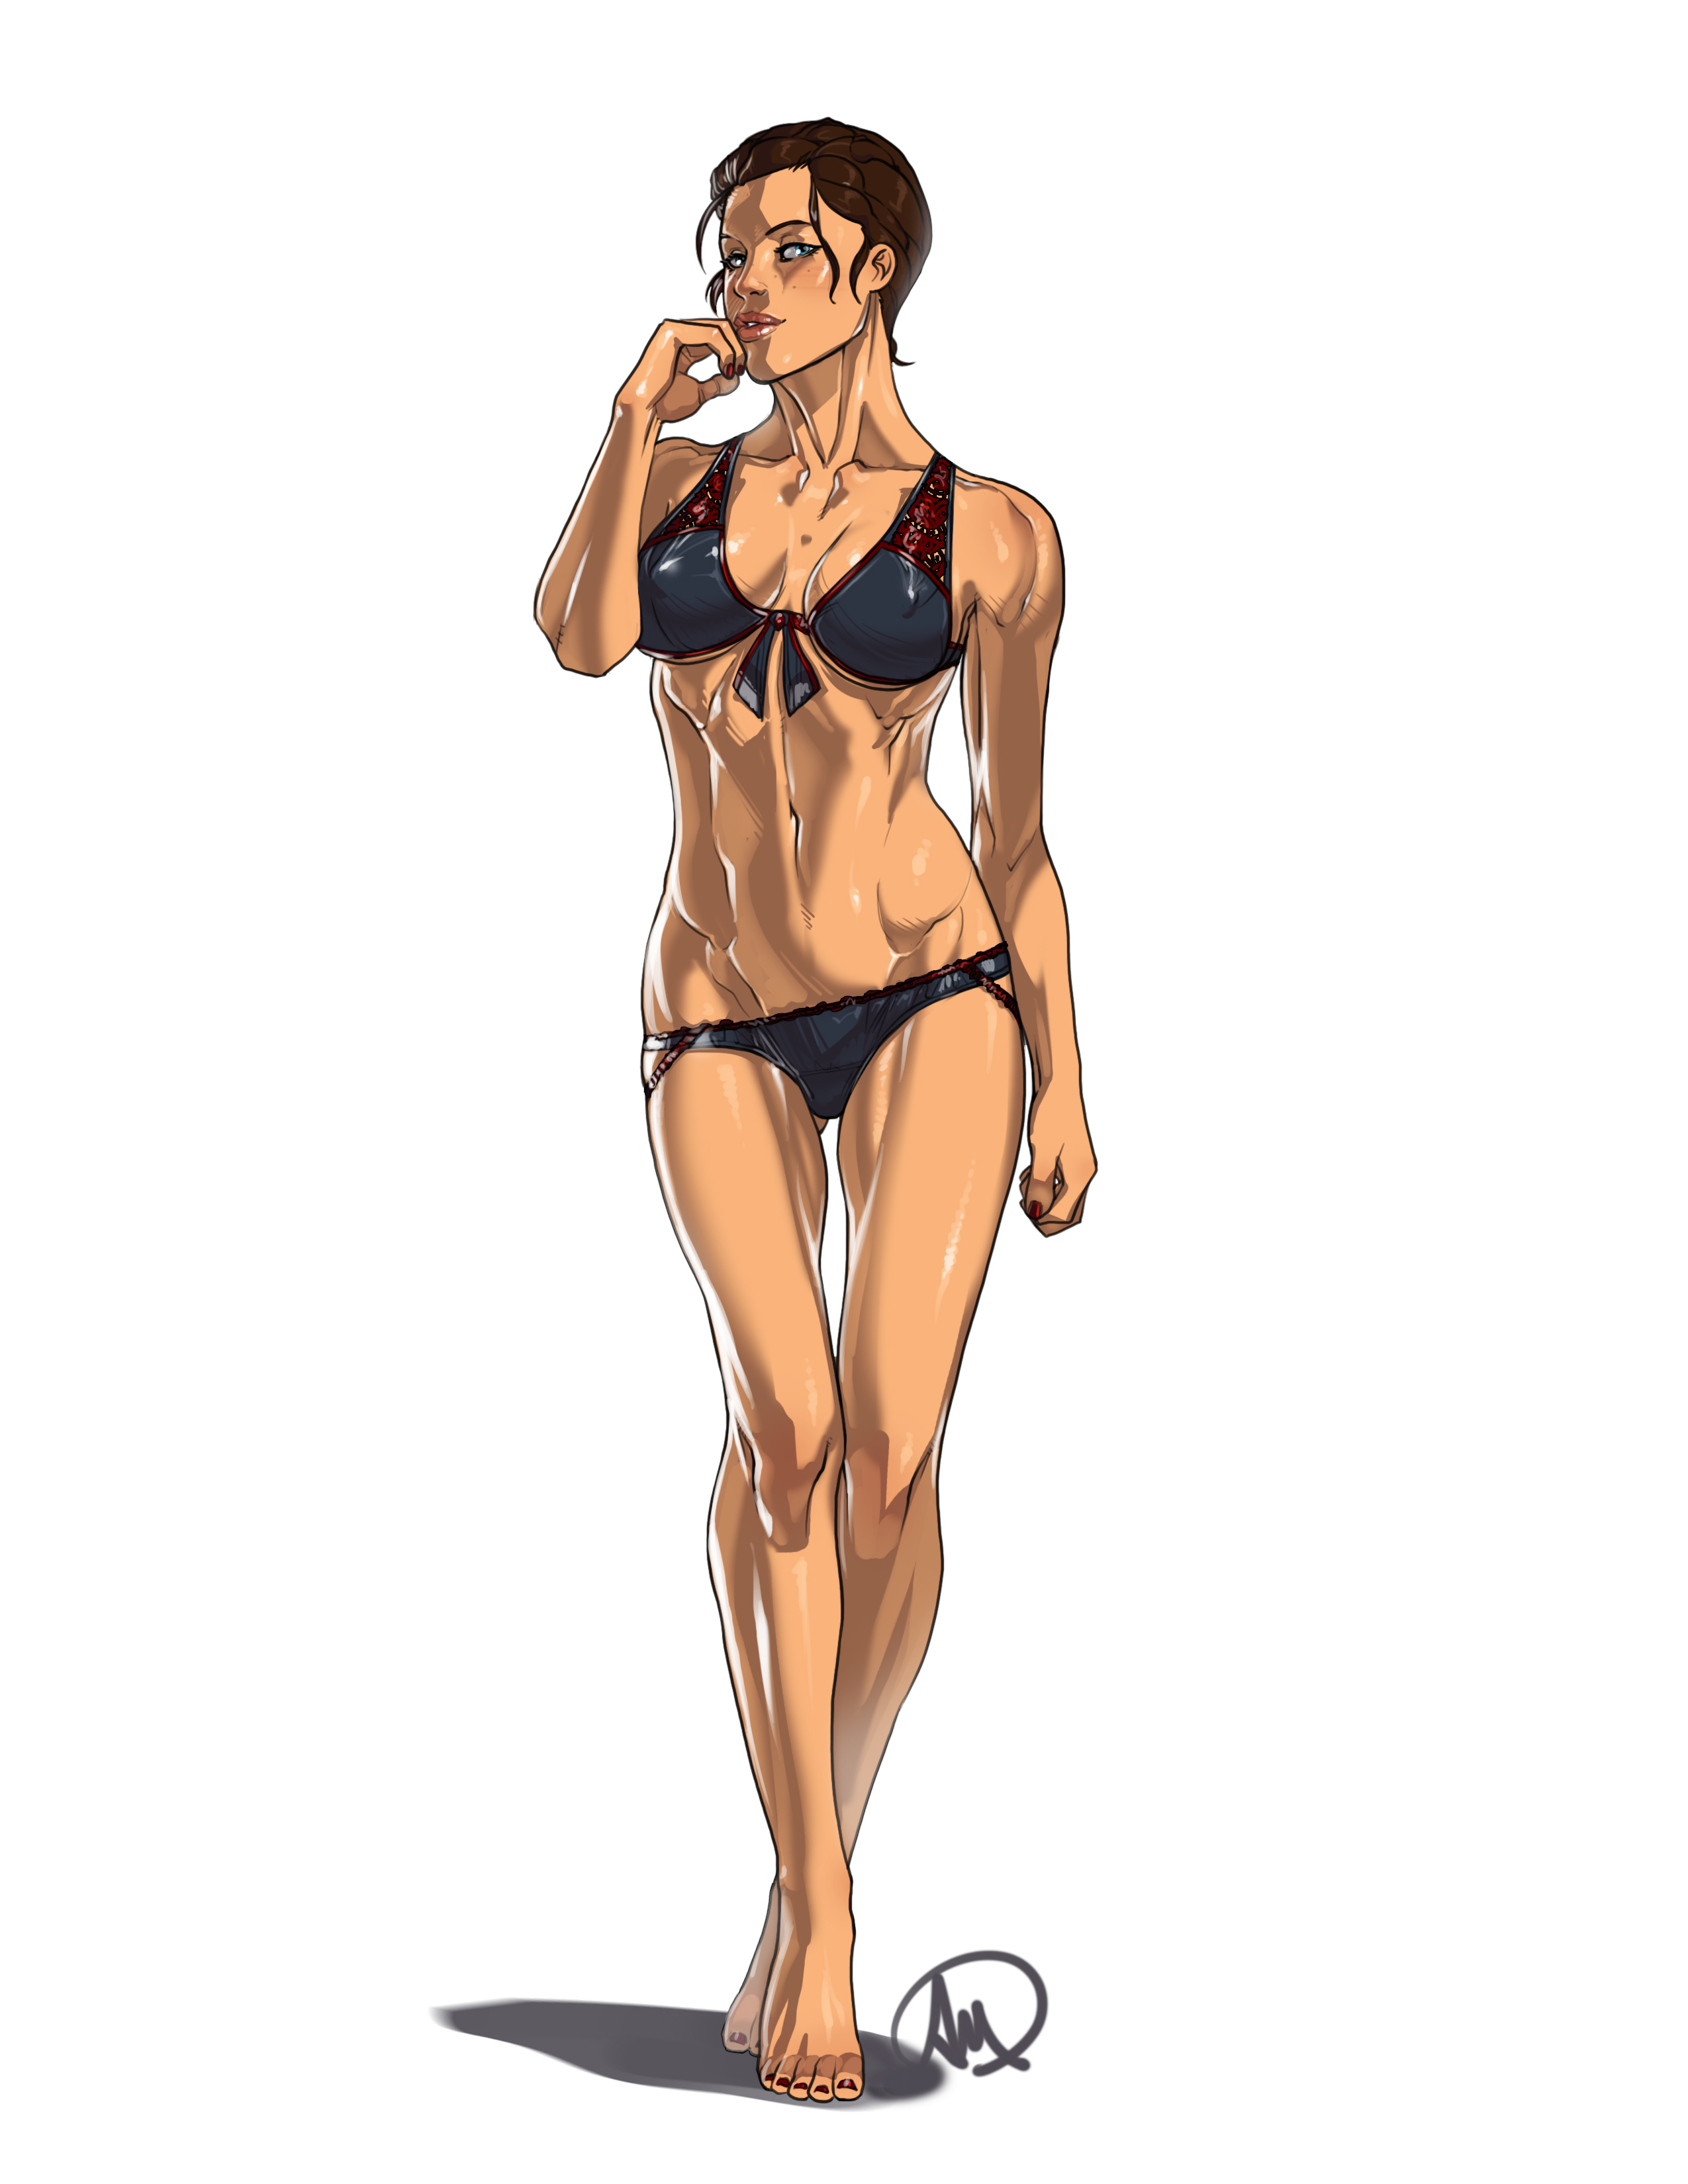 Assassins Creed Evie Frye bikini by elcarlo42 on DeviantArt